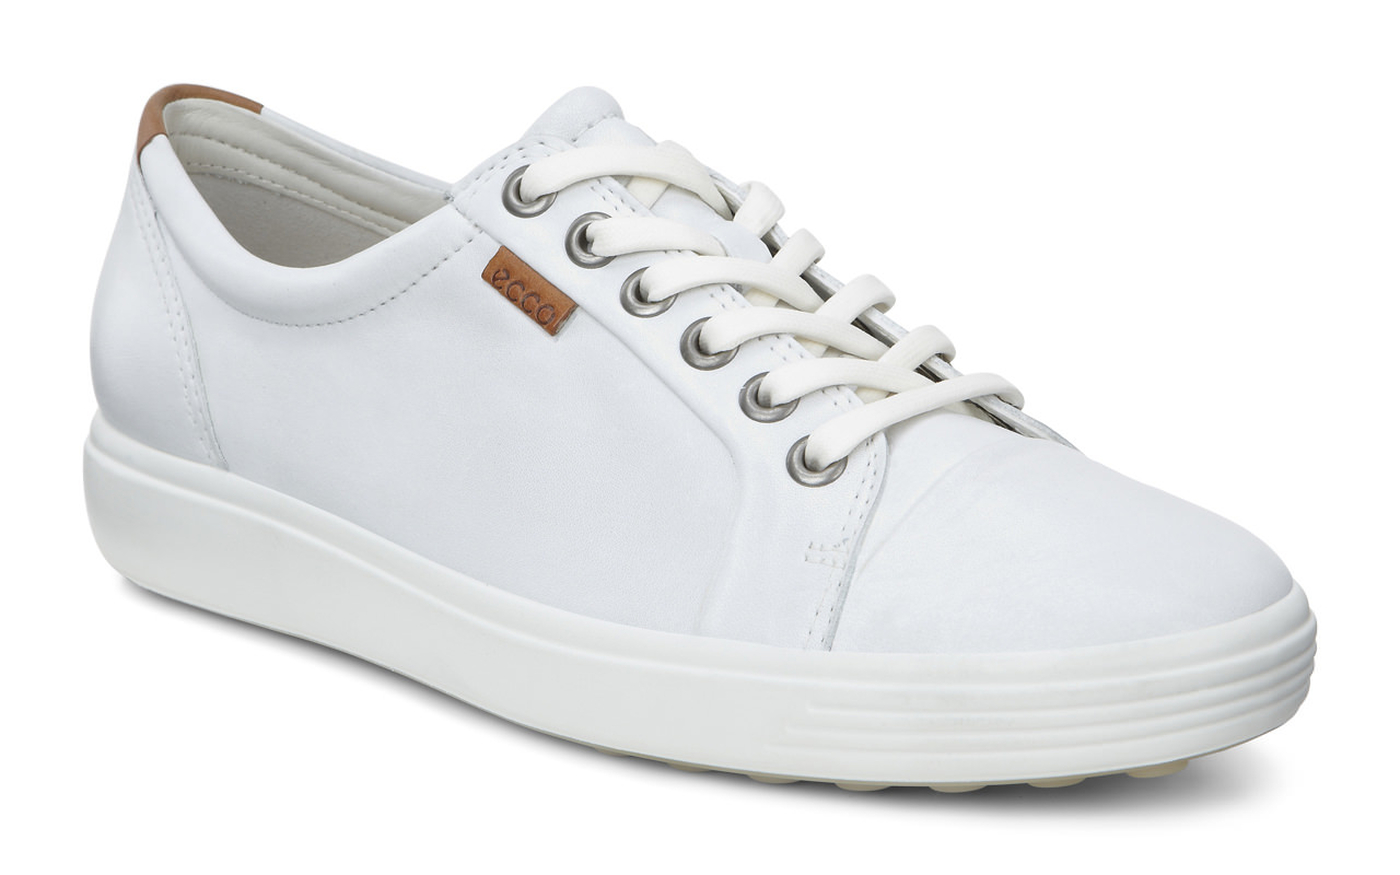 ab847bad357a6 ECCO Women s Soft 7 Sneaker